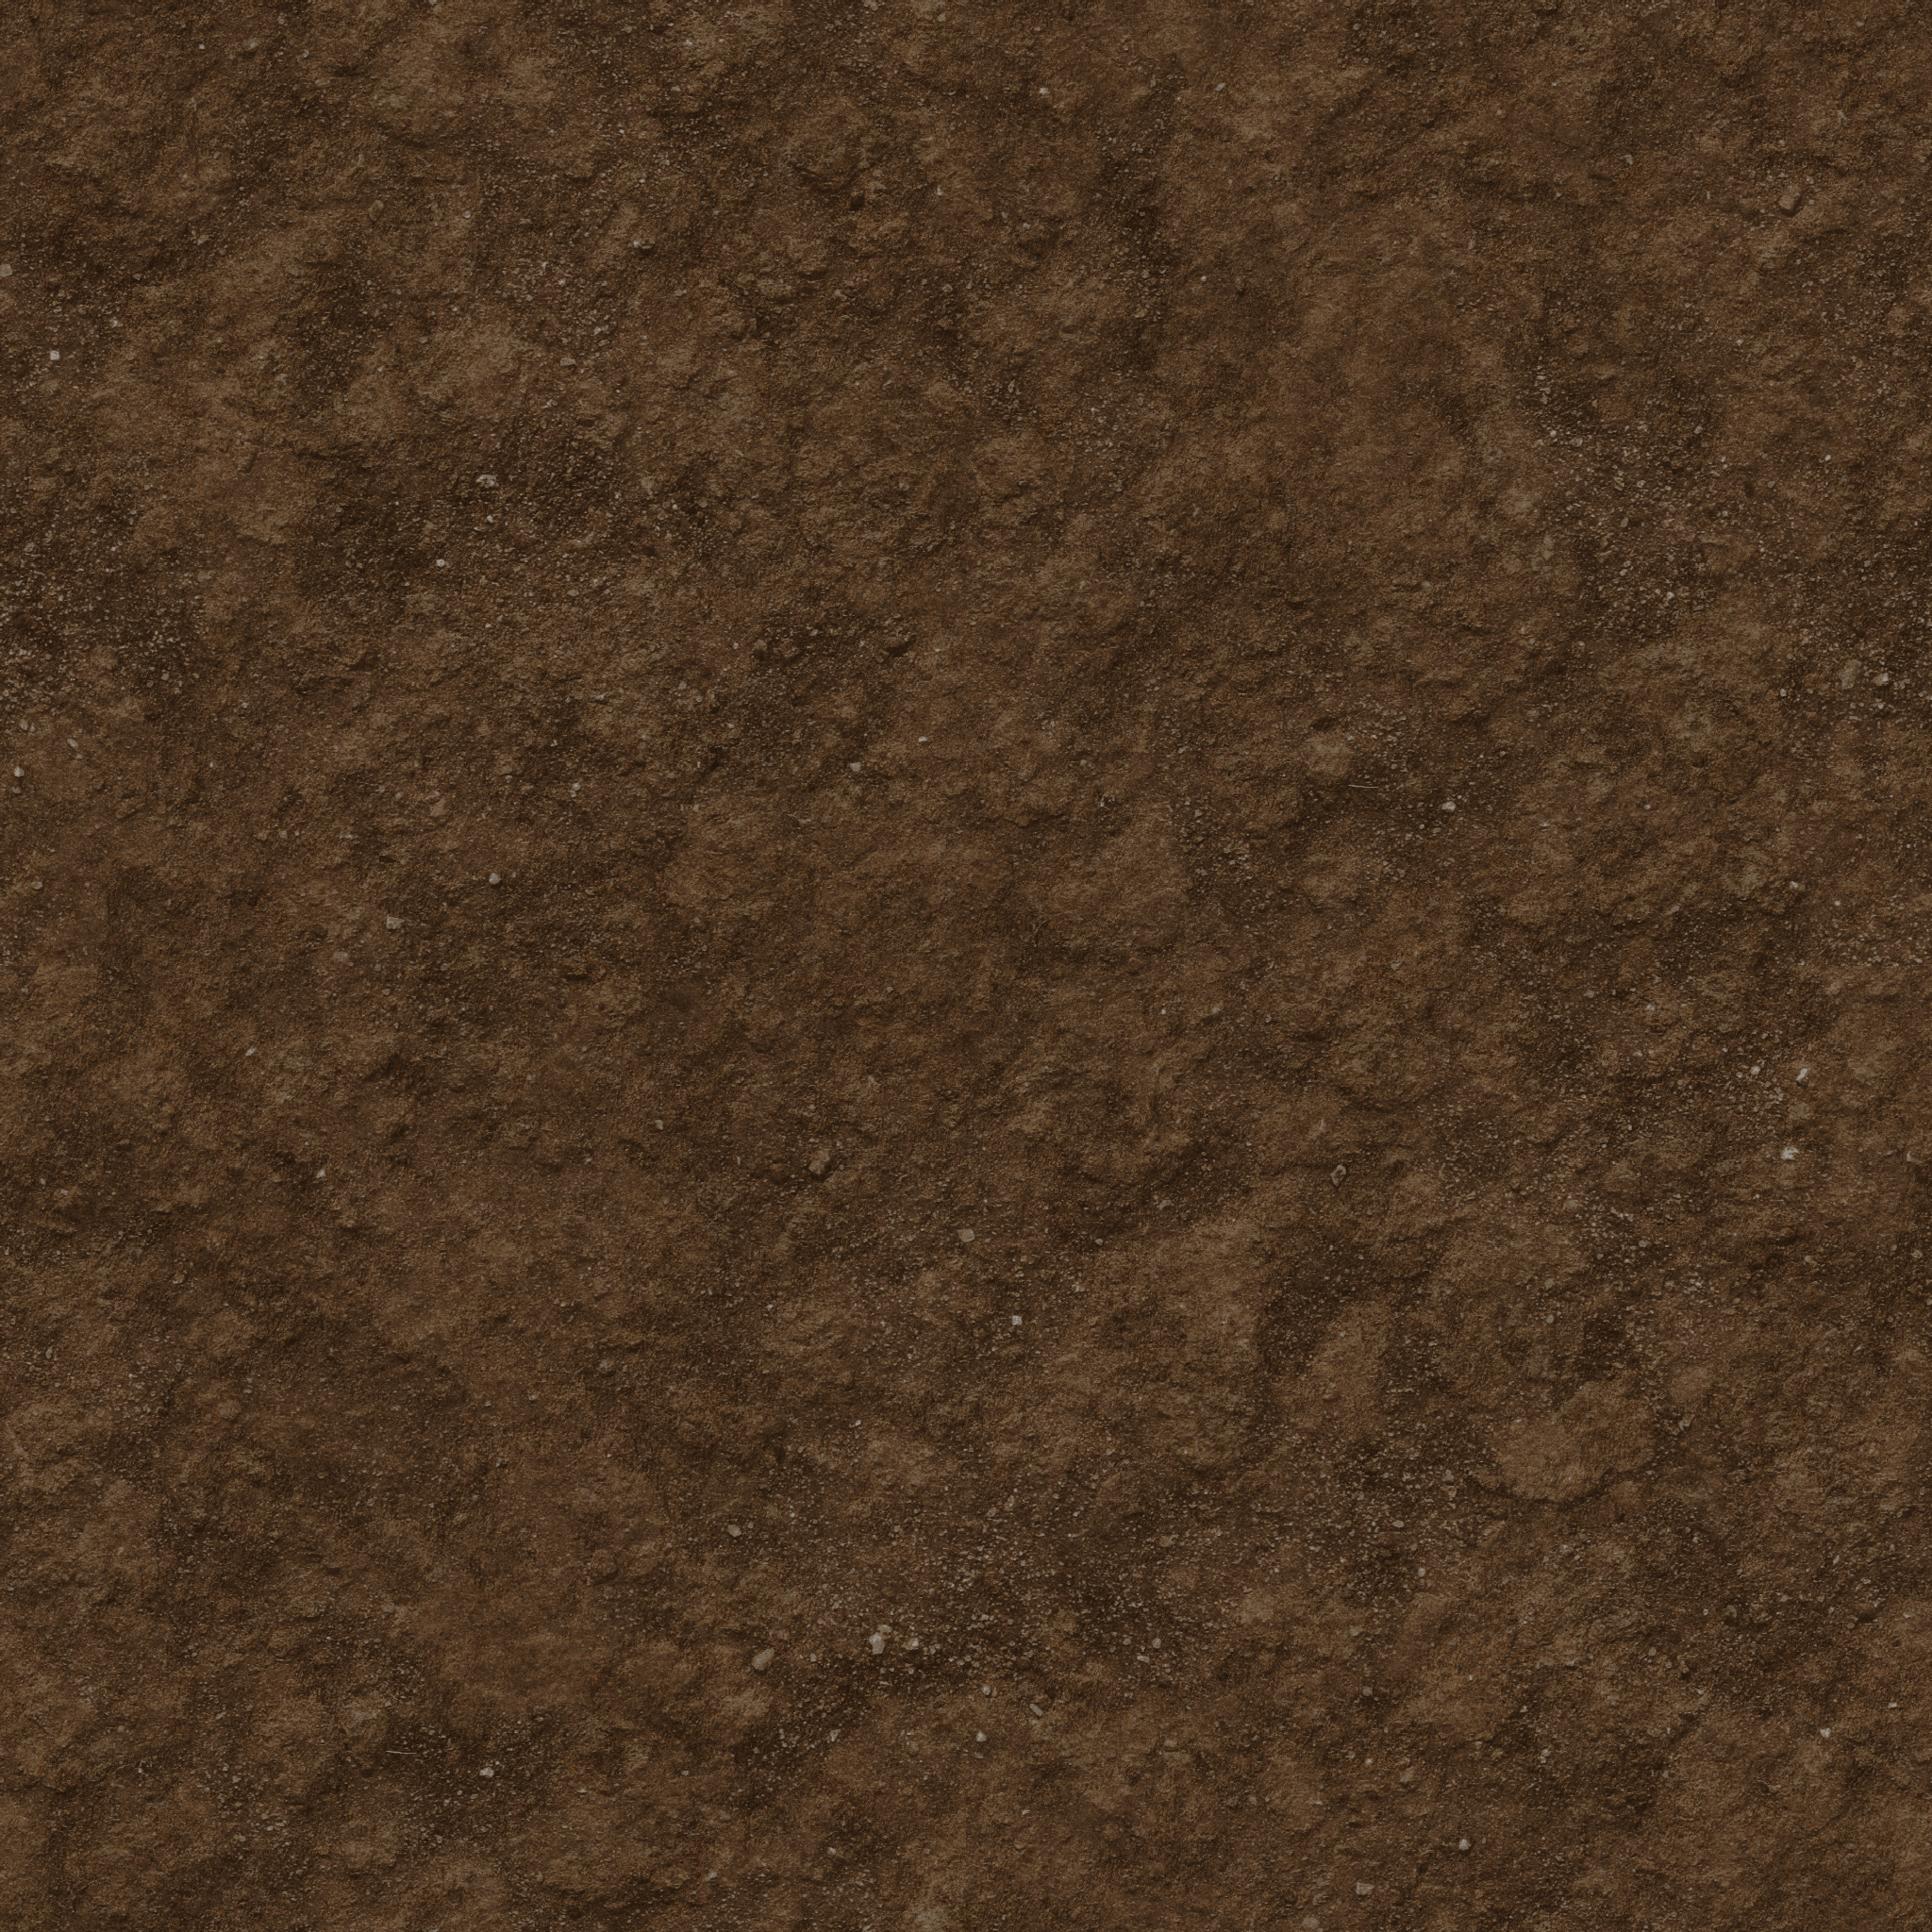 Ground texture photo